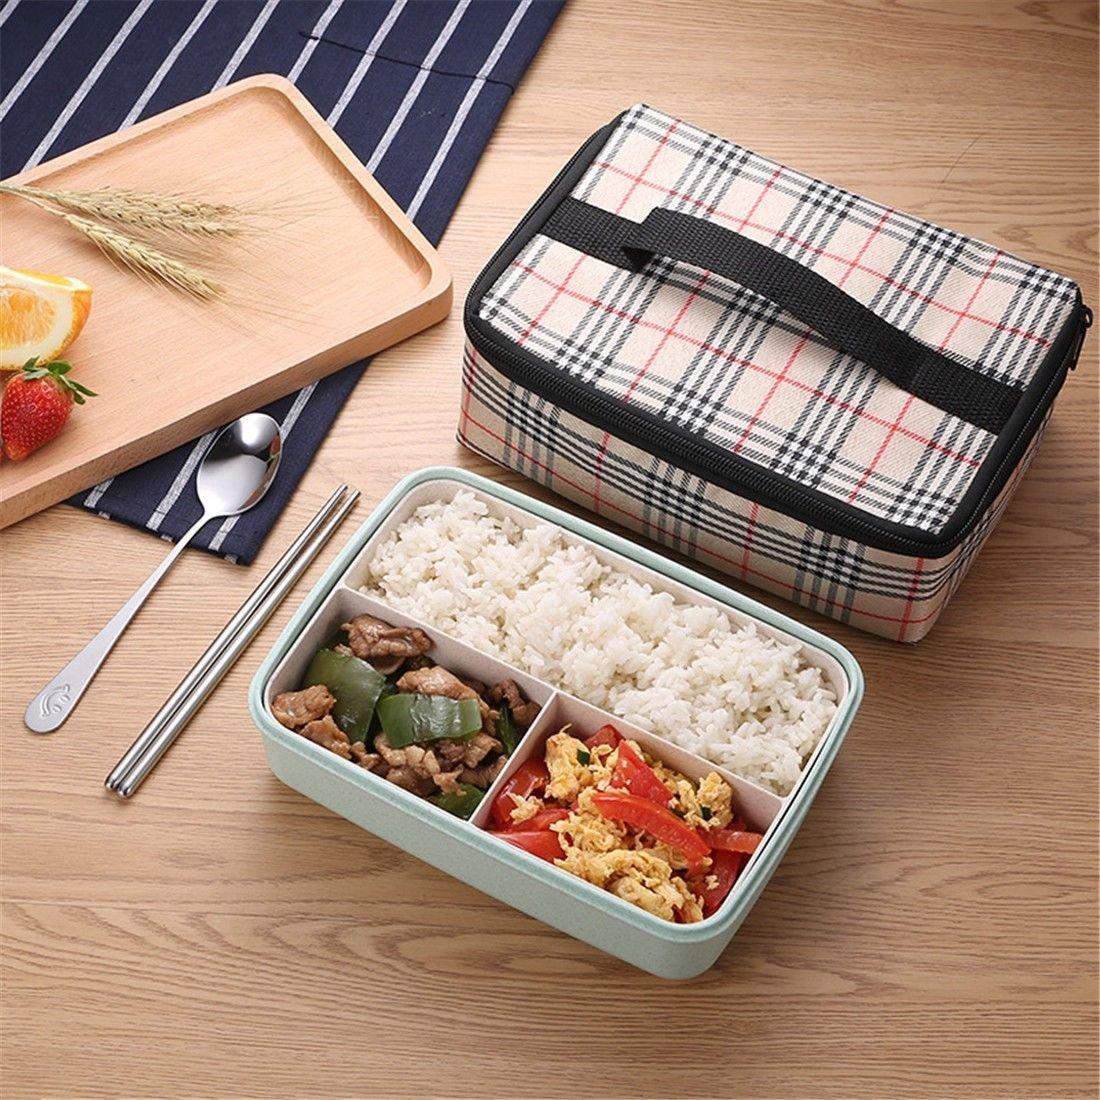 ZLLi ZLLi ZLLi Caja de almuerzo de microondas caja de almuerzo caja de almuerzo plástica sellada a prueba de calor caja de almuerzo, verde nórdico 0186ae